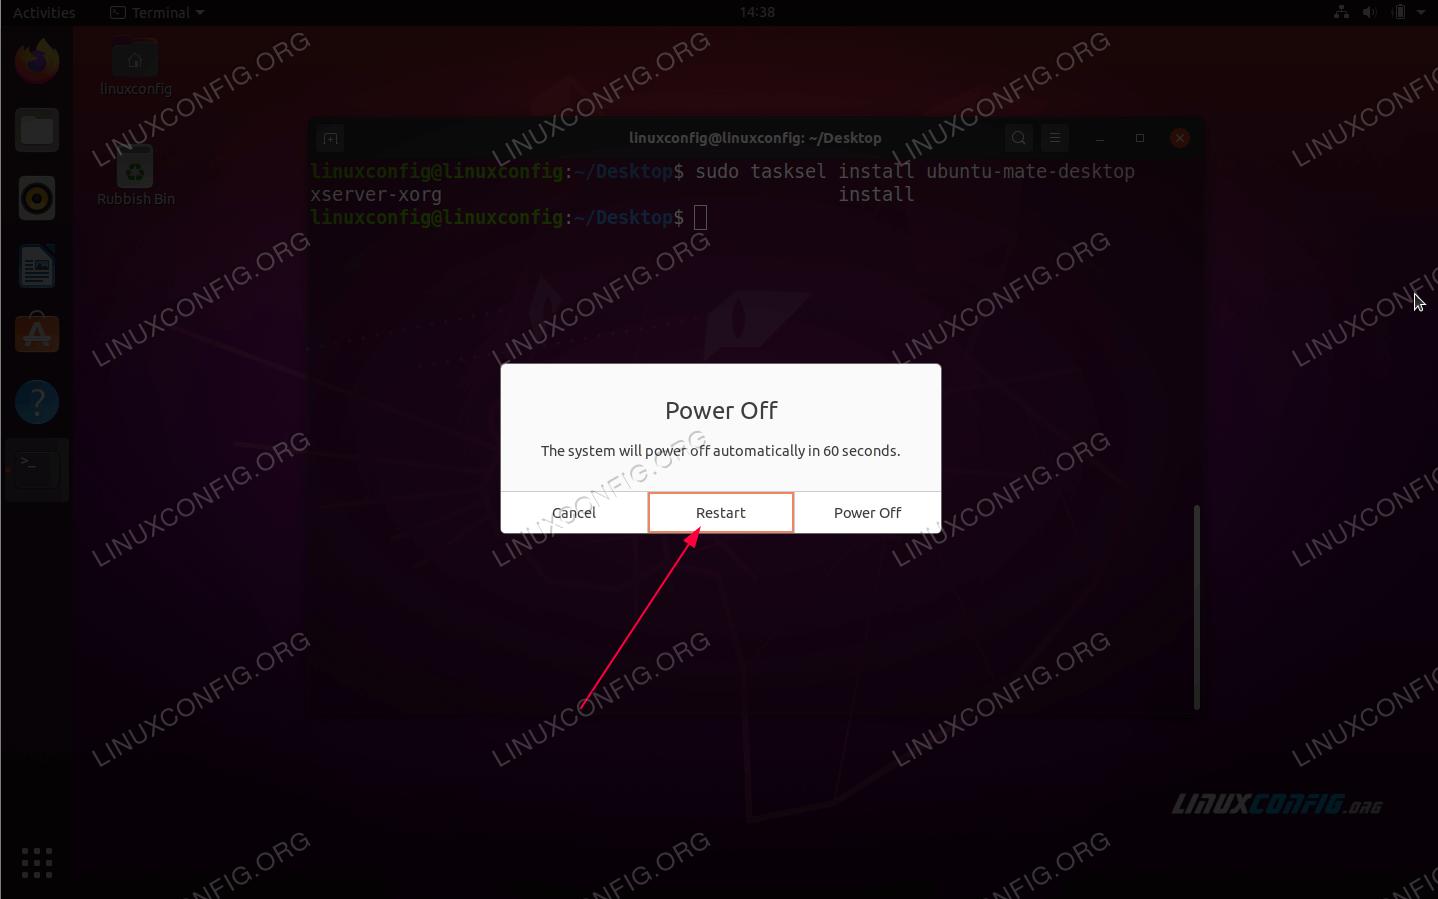 Reboot your Ubuntu 20.04 system